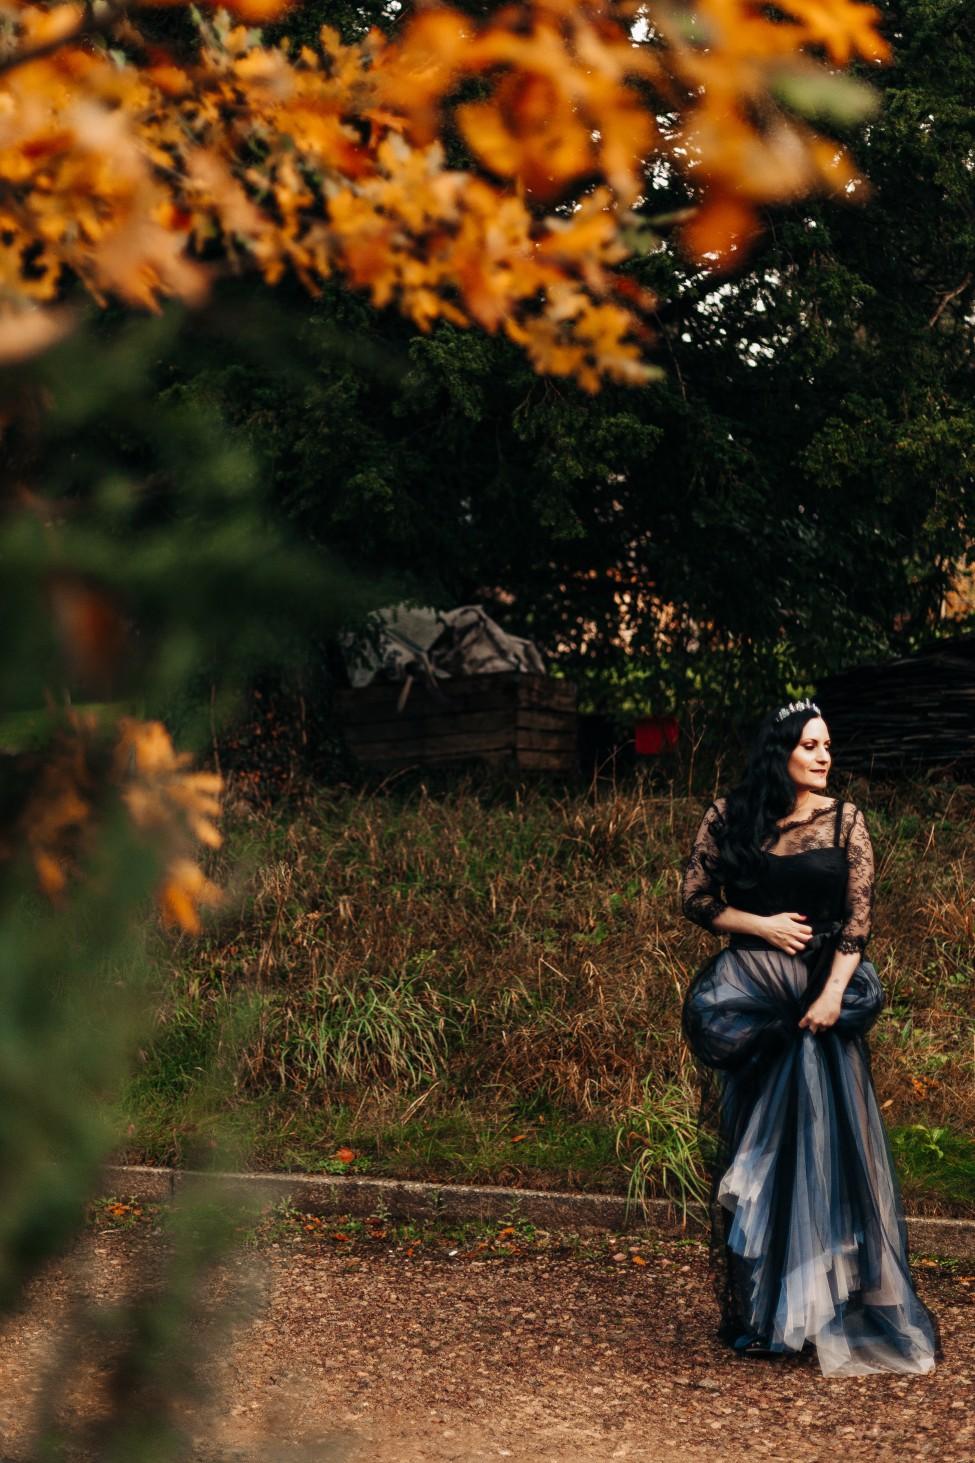 bespoke black wedding dress- alternative bridal wear - unique wedding inspiration